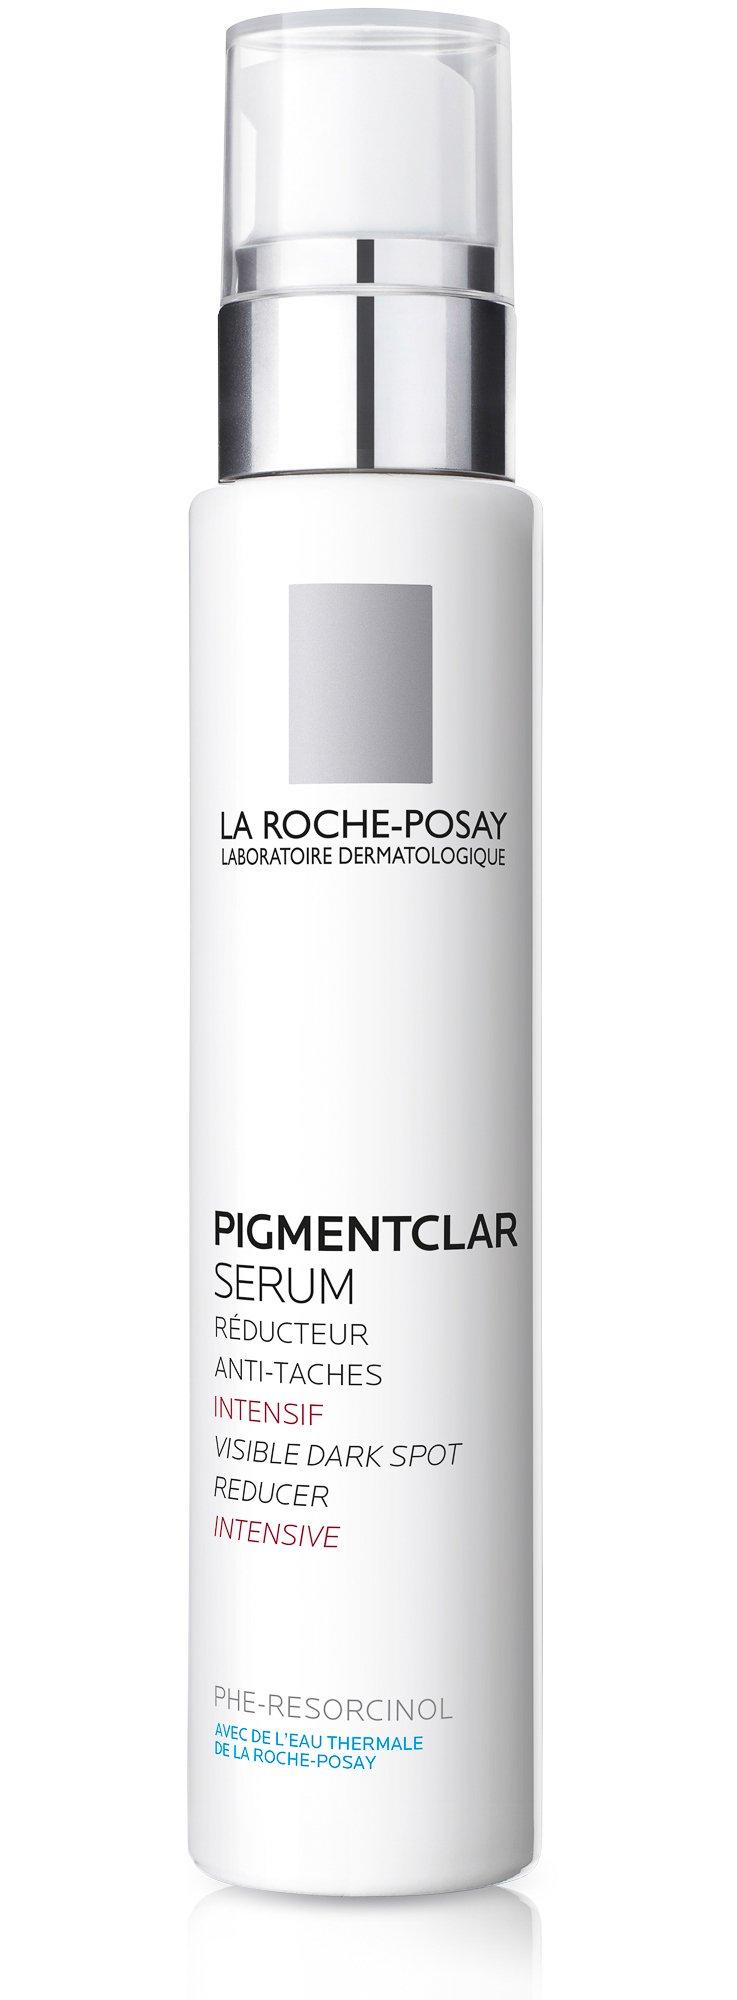 La Roche Posay Pigmentaclar Serum Anti-Manchas - 30 gr product image